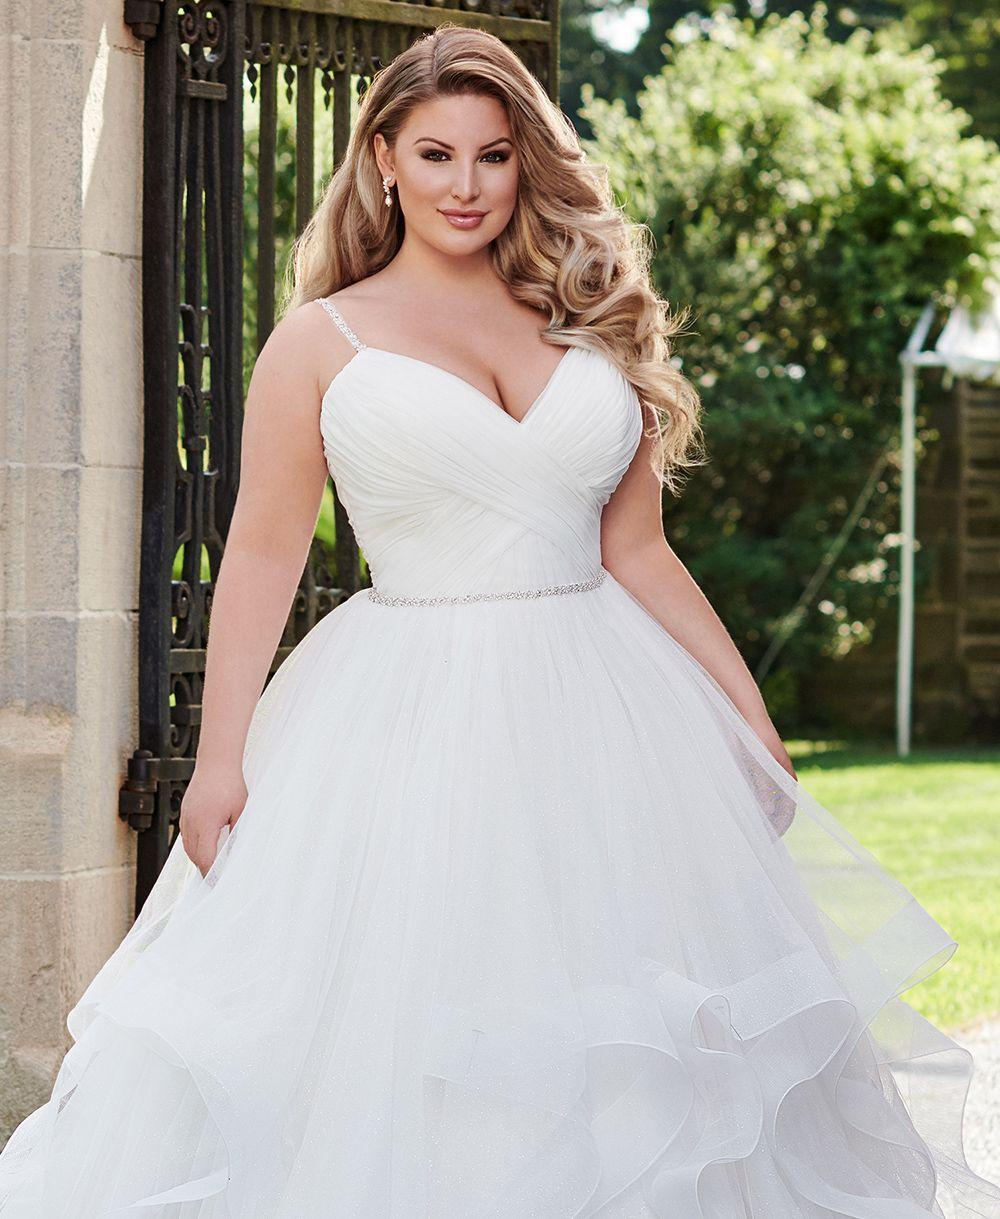 Martin Thornburg Wedding Dresses Mon Cheri Bridal wear